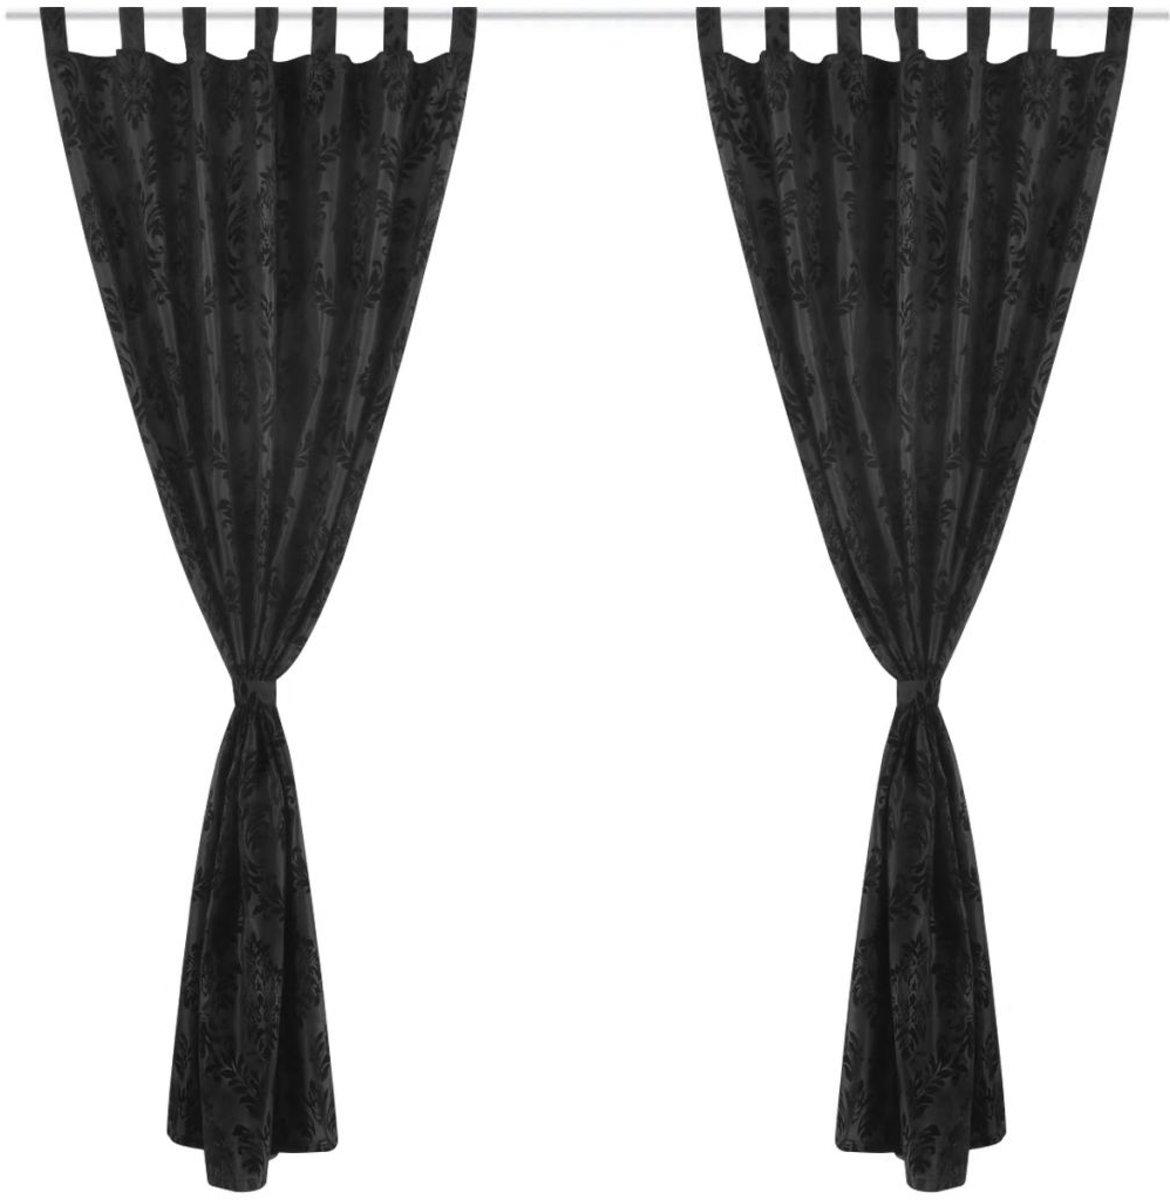 bol.com | vidaXL 2 Gordijnen tafzijde barok 140 x 245 cm zwart